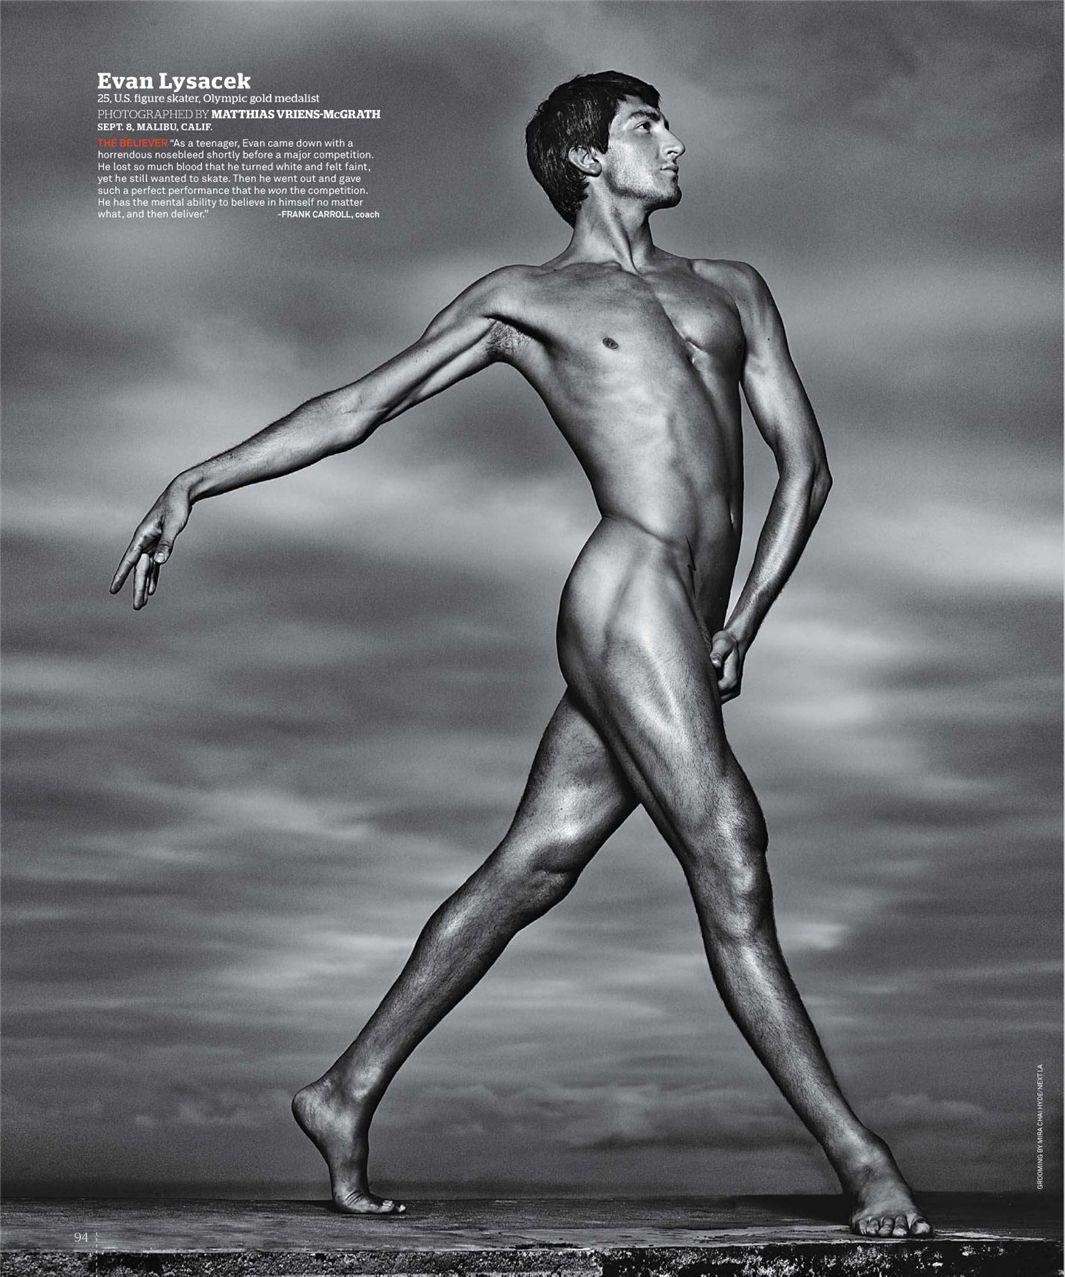 Эван Лысачек / Evan Lysacek - ESPN Magazine Body Issue 18 october 2010